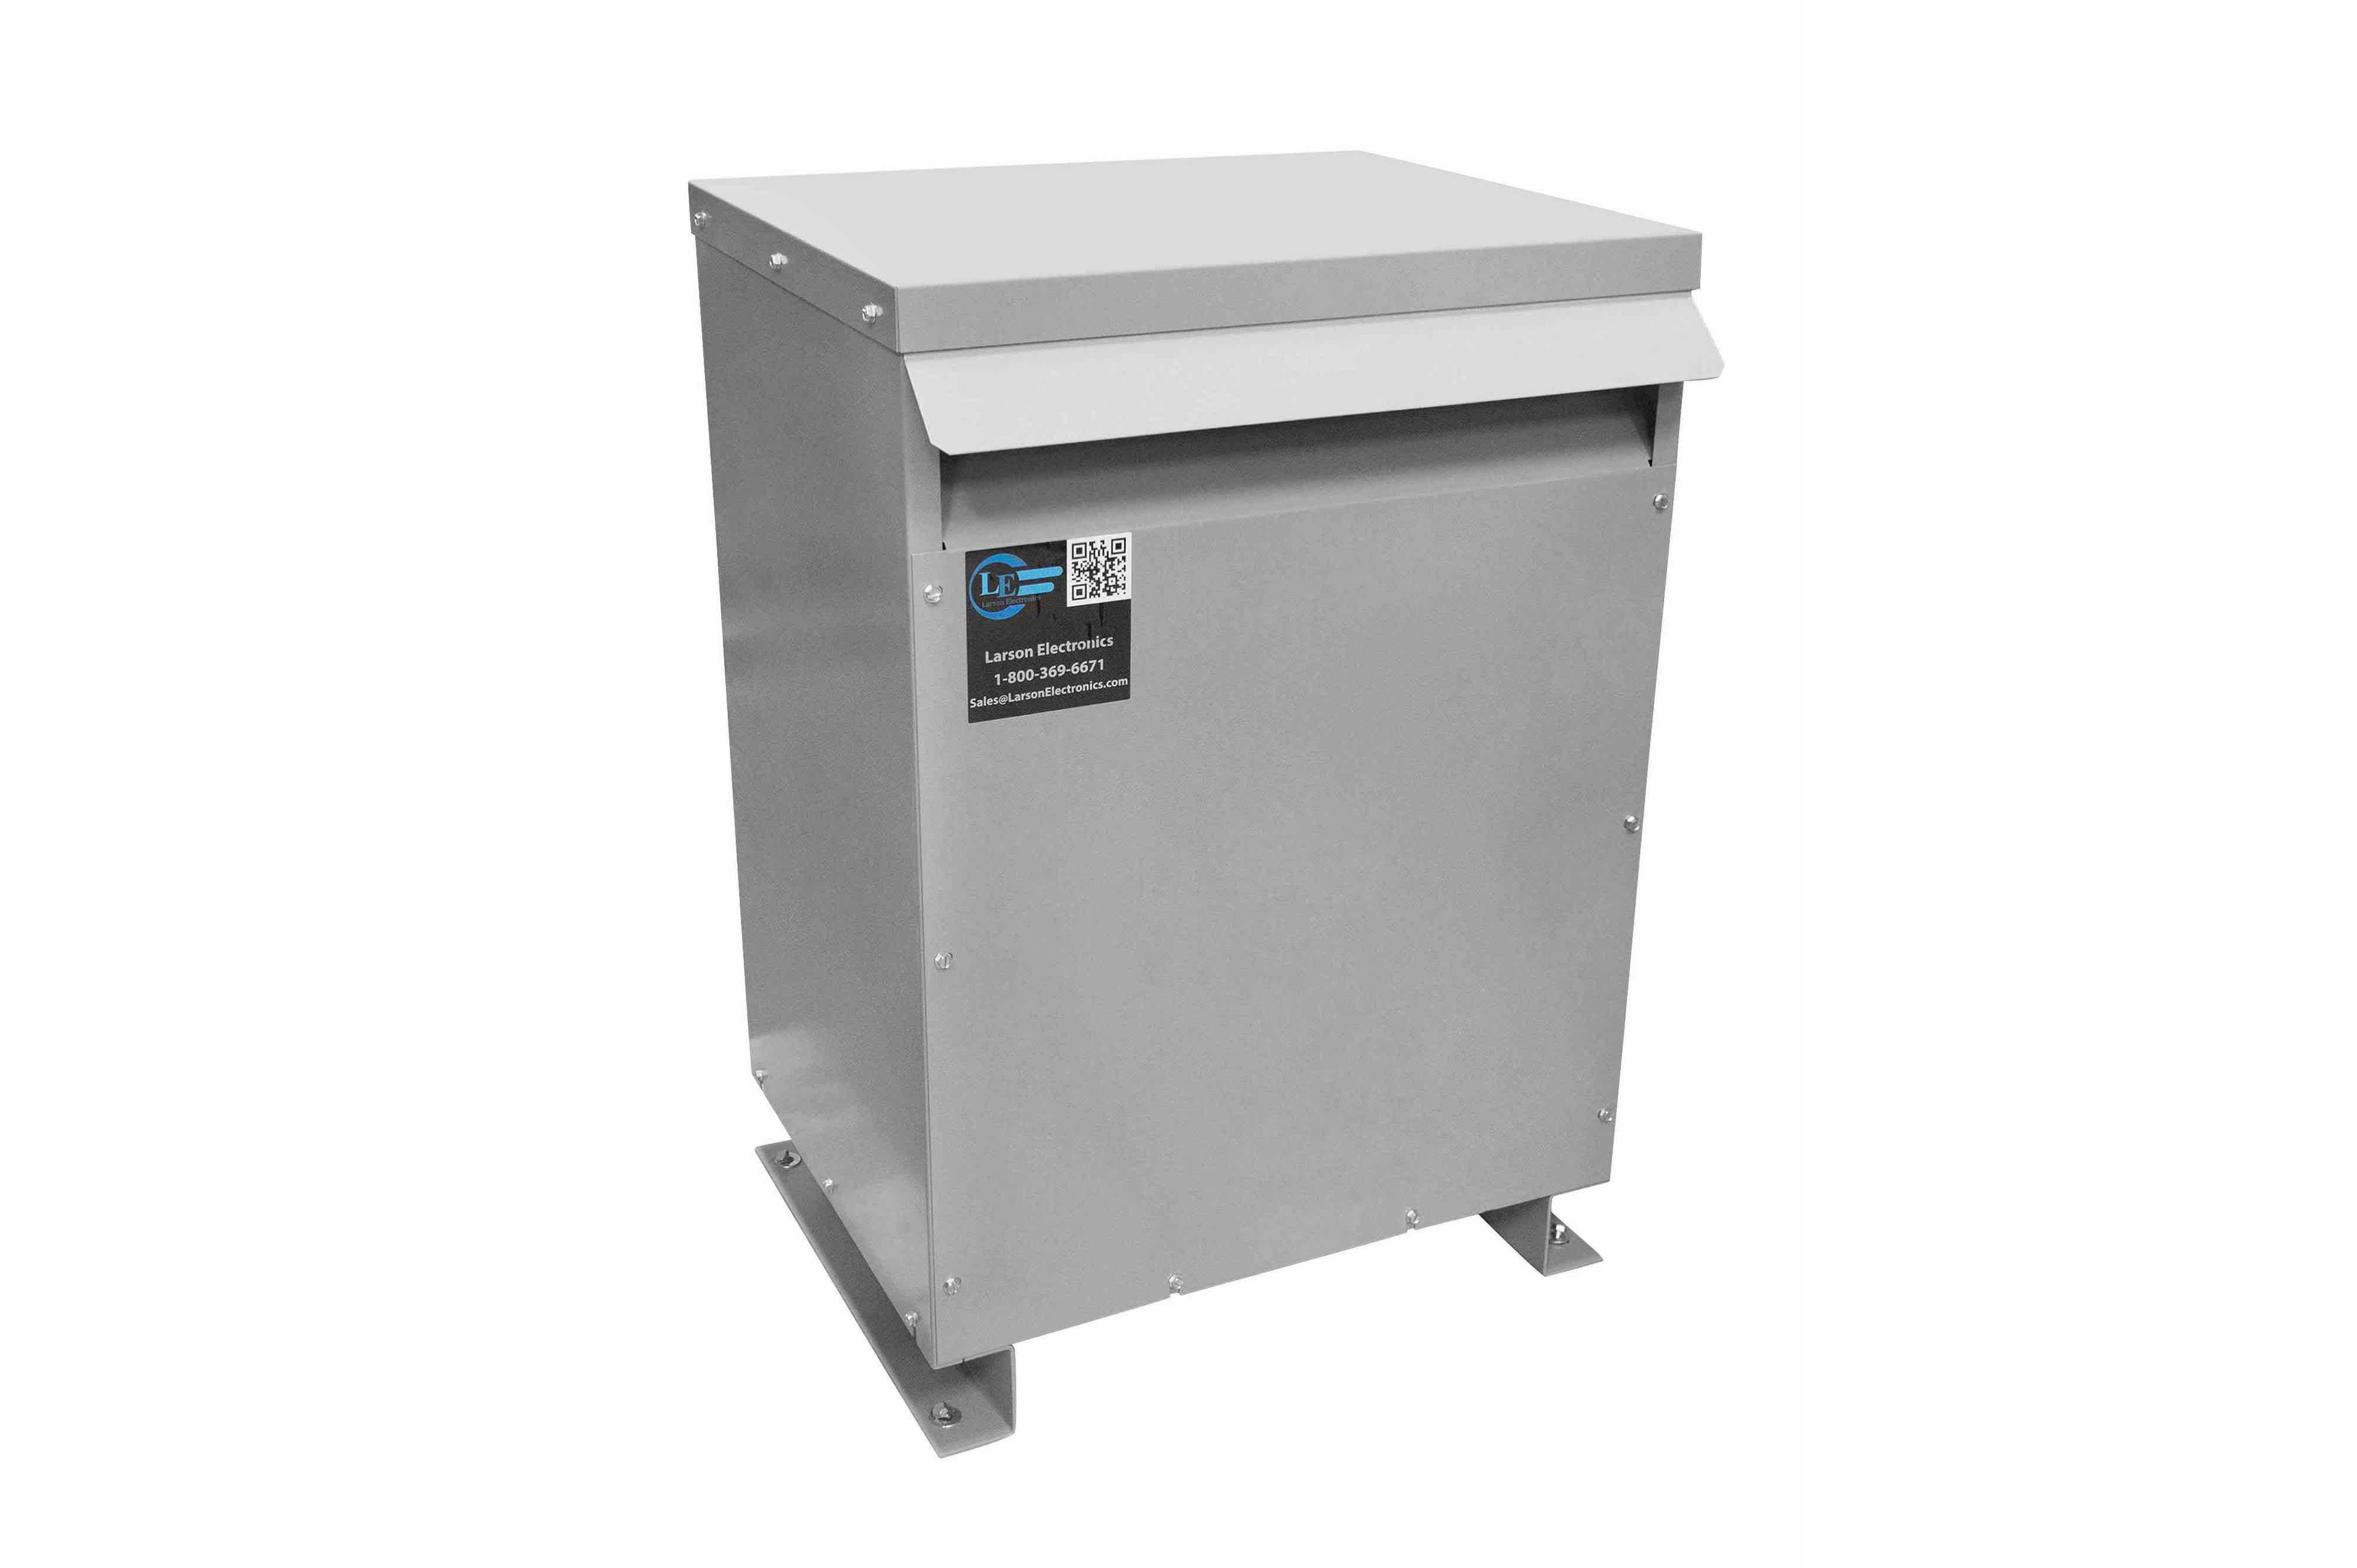 37.5 kVA 3PH Isolation Transformer, 240V Wye Primary, 380Y/220 Wye-N Secondary, N3R, Ventilated, 60 Hz